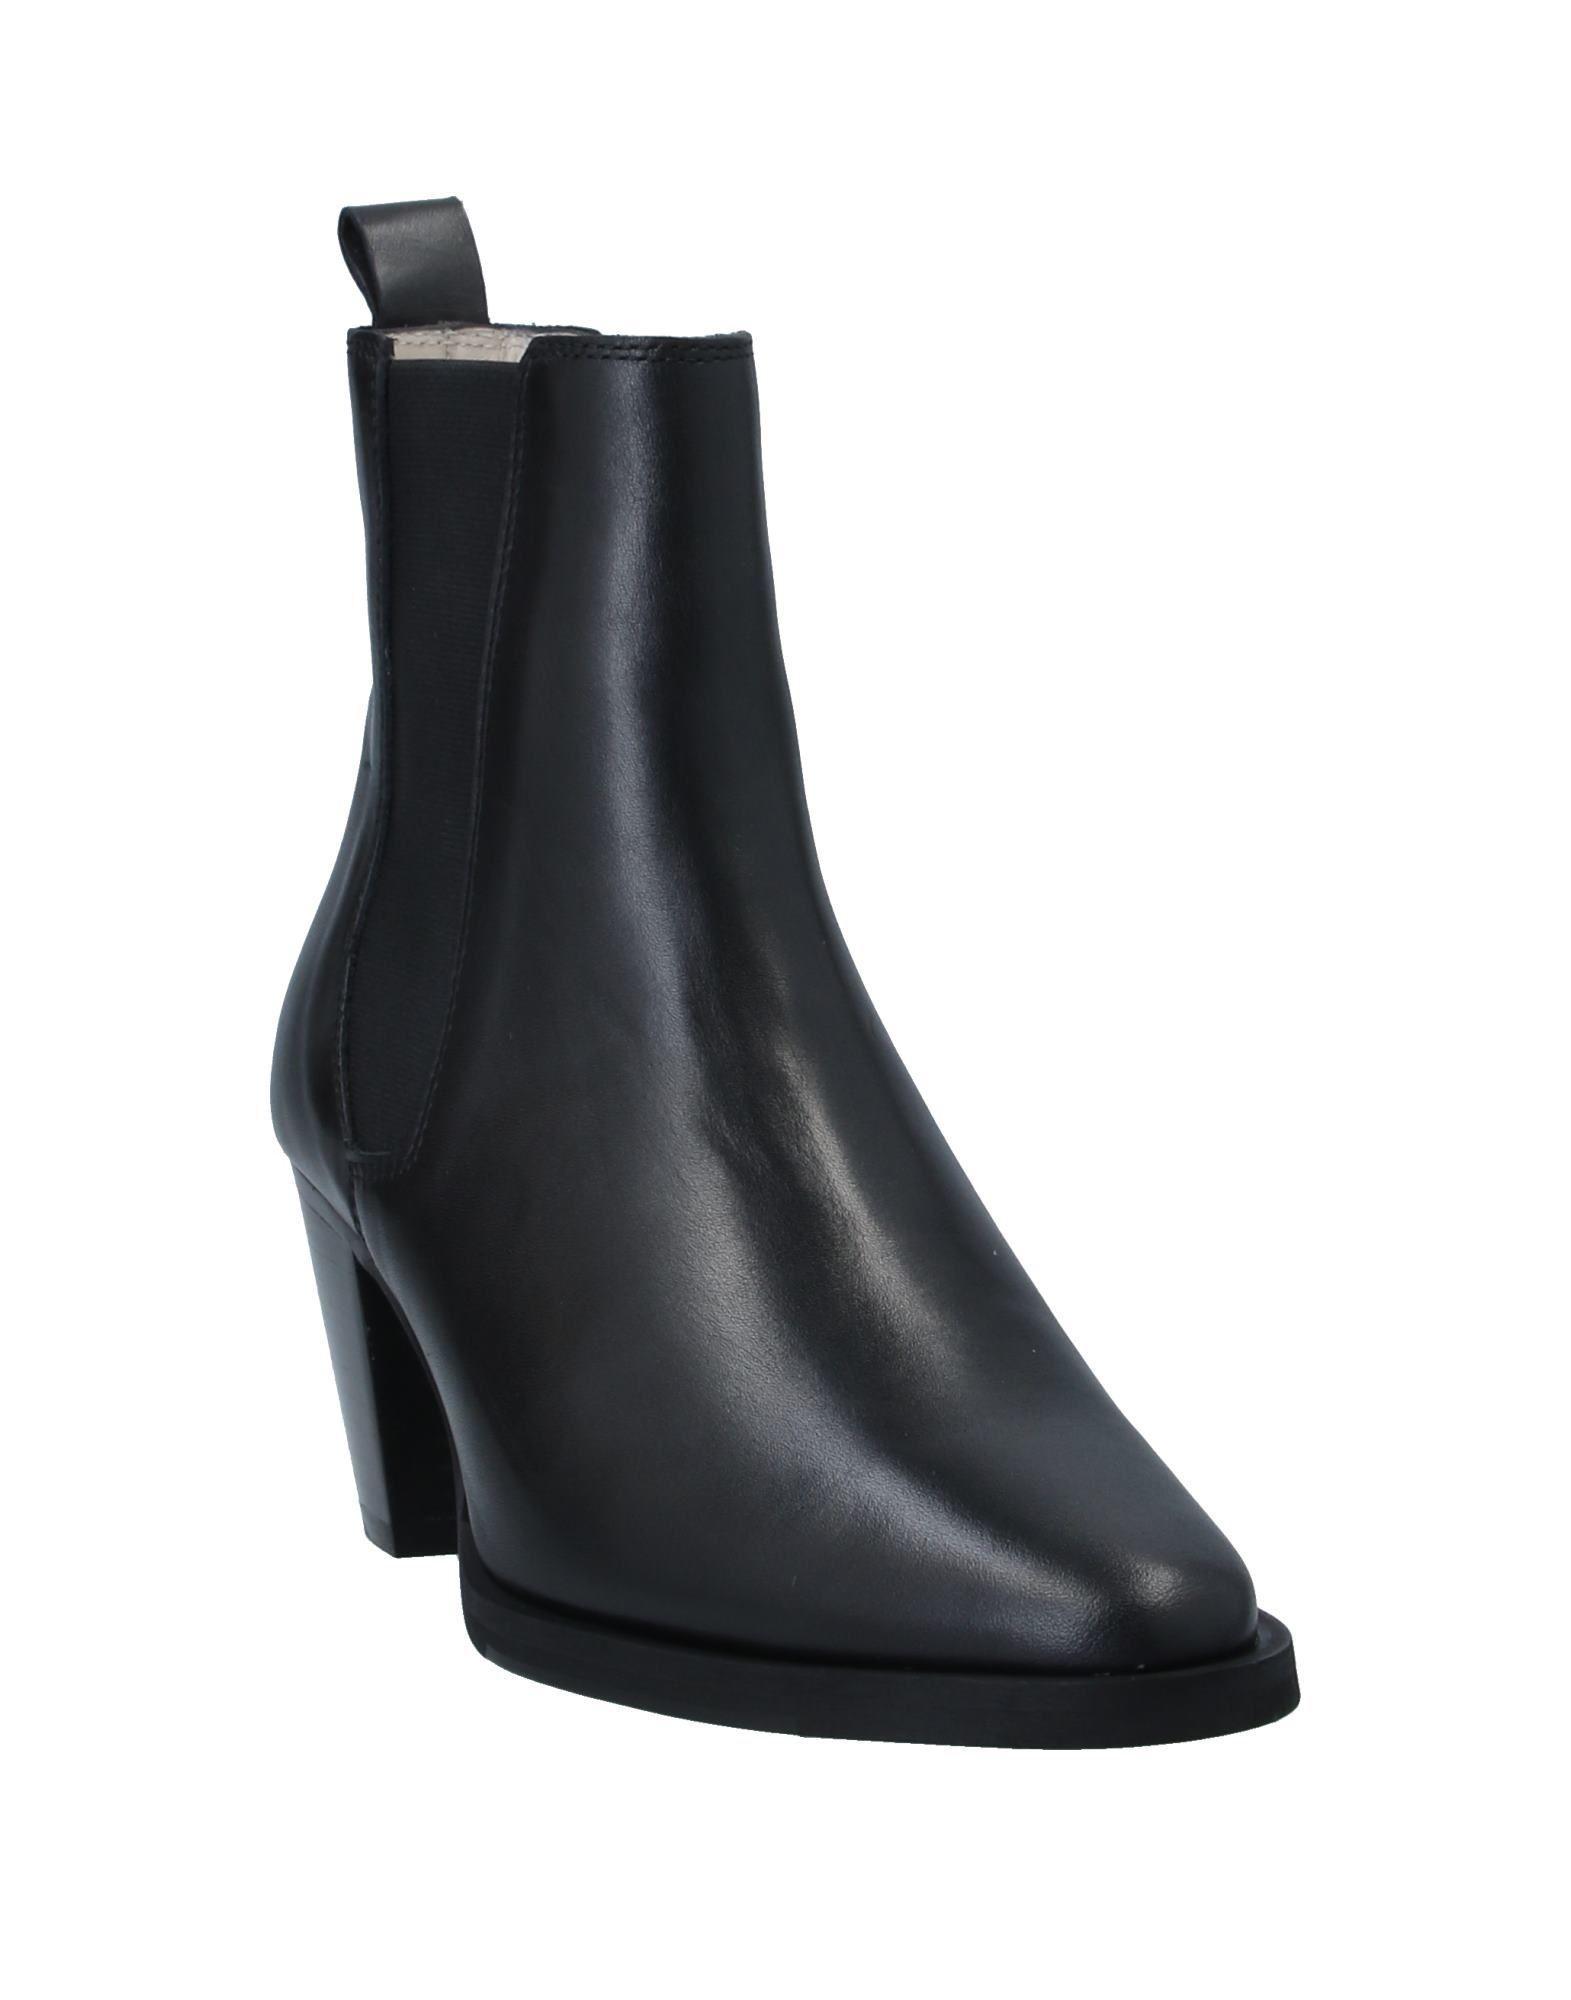 Botines de caña alta Royal Republiq de Cuero de color Negro